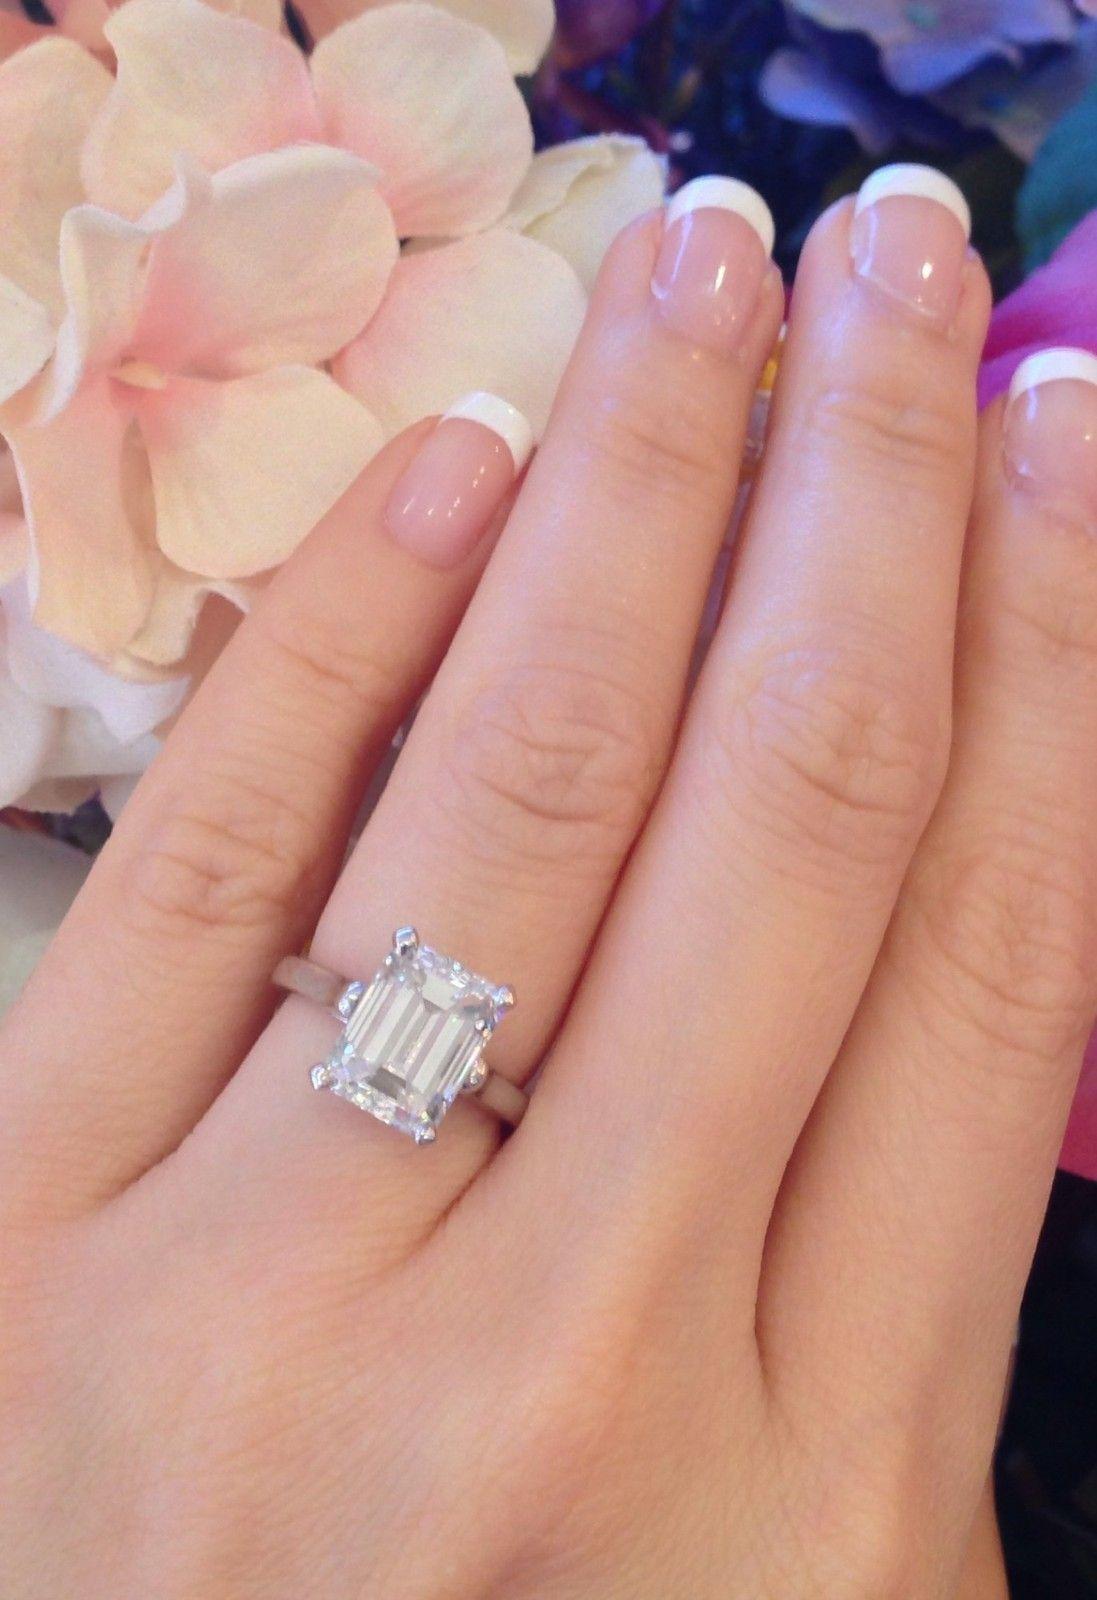 · Tiffany & Co 3.86 ct GIA VS2-G Emerald Cut Platinum Diamond ...